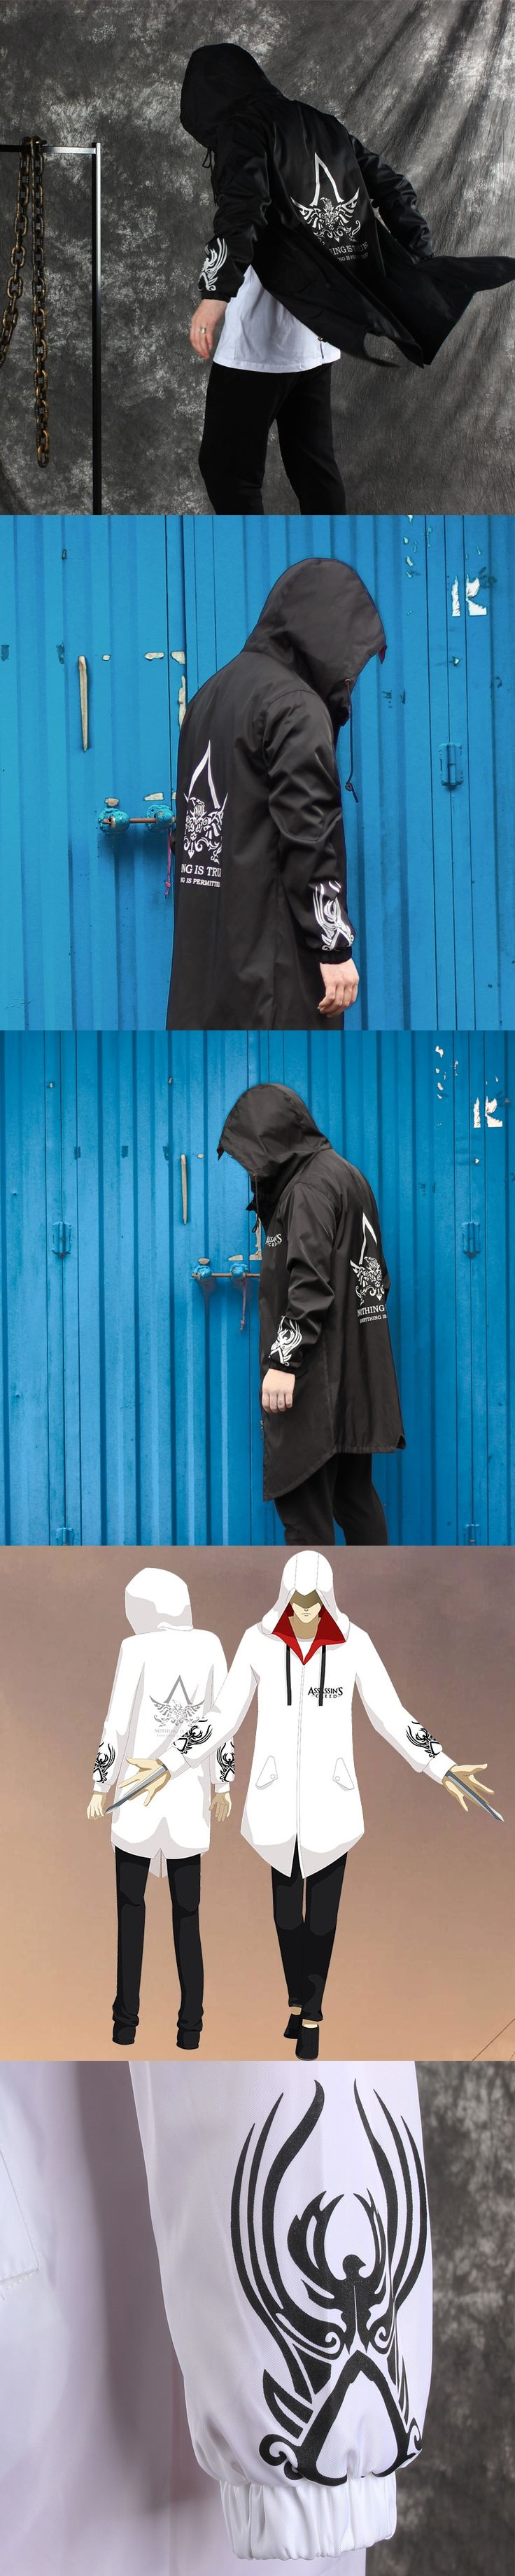 Assassin's Creed hoodie Medium length  mens black overcoat trench coat men Dark cosplay assassins creed Hooded hoodies moletom